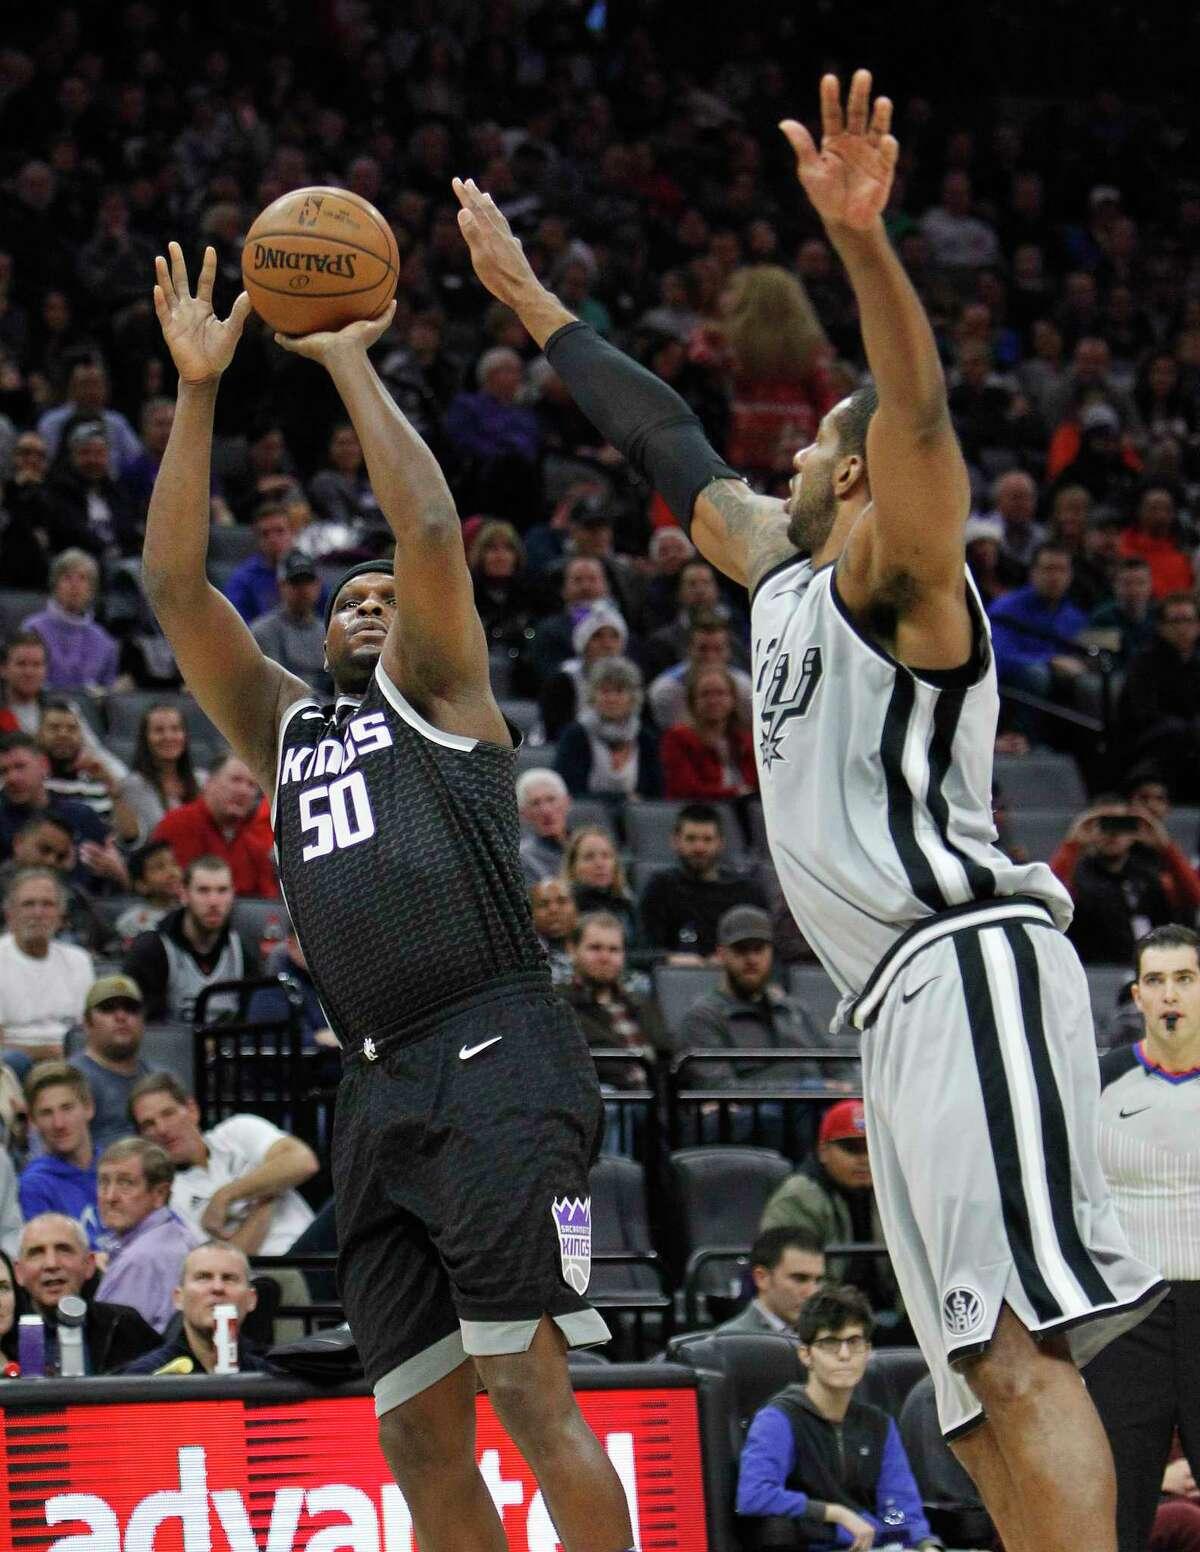 Sacramento Kings forward Zach Randolph (50) shoots over San Antonio Spurs' LaMarcus Aldridge during the first half of an NBA basketball game in Sacramento, Calif., Saturday, Dec 23, 2017. (AP Photo/Steve Yeater)